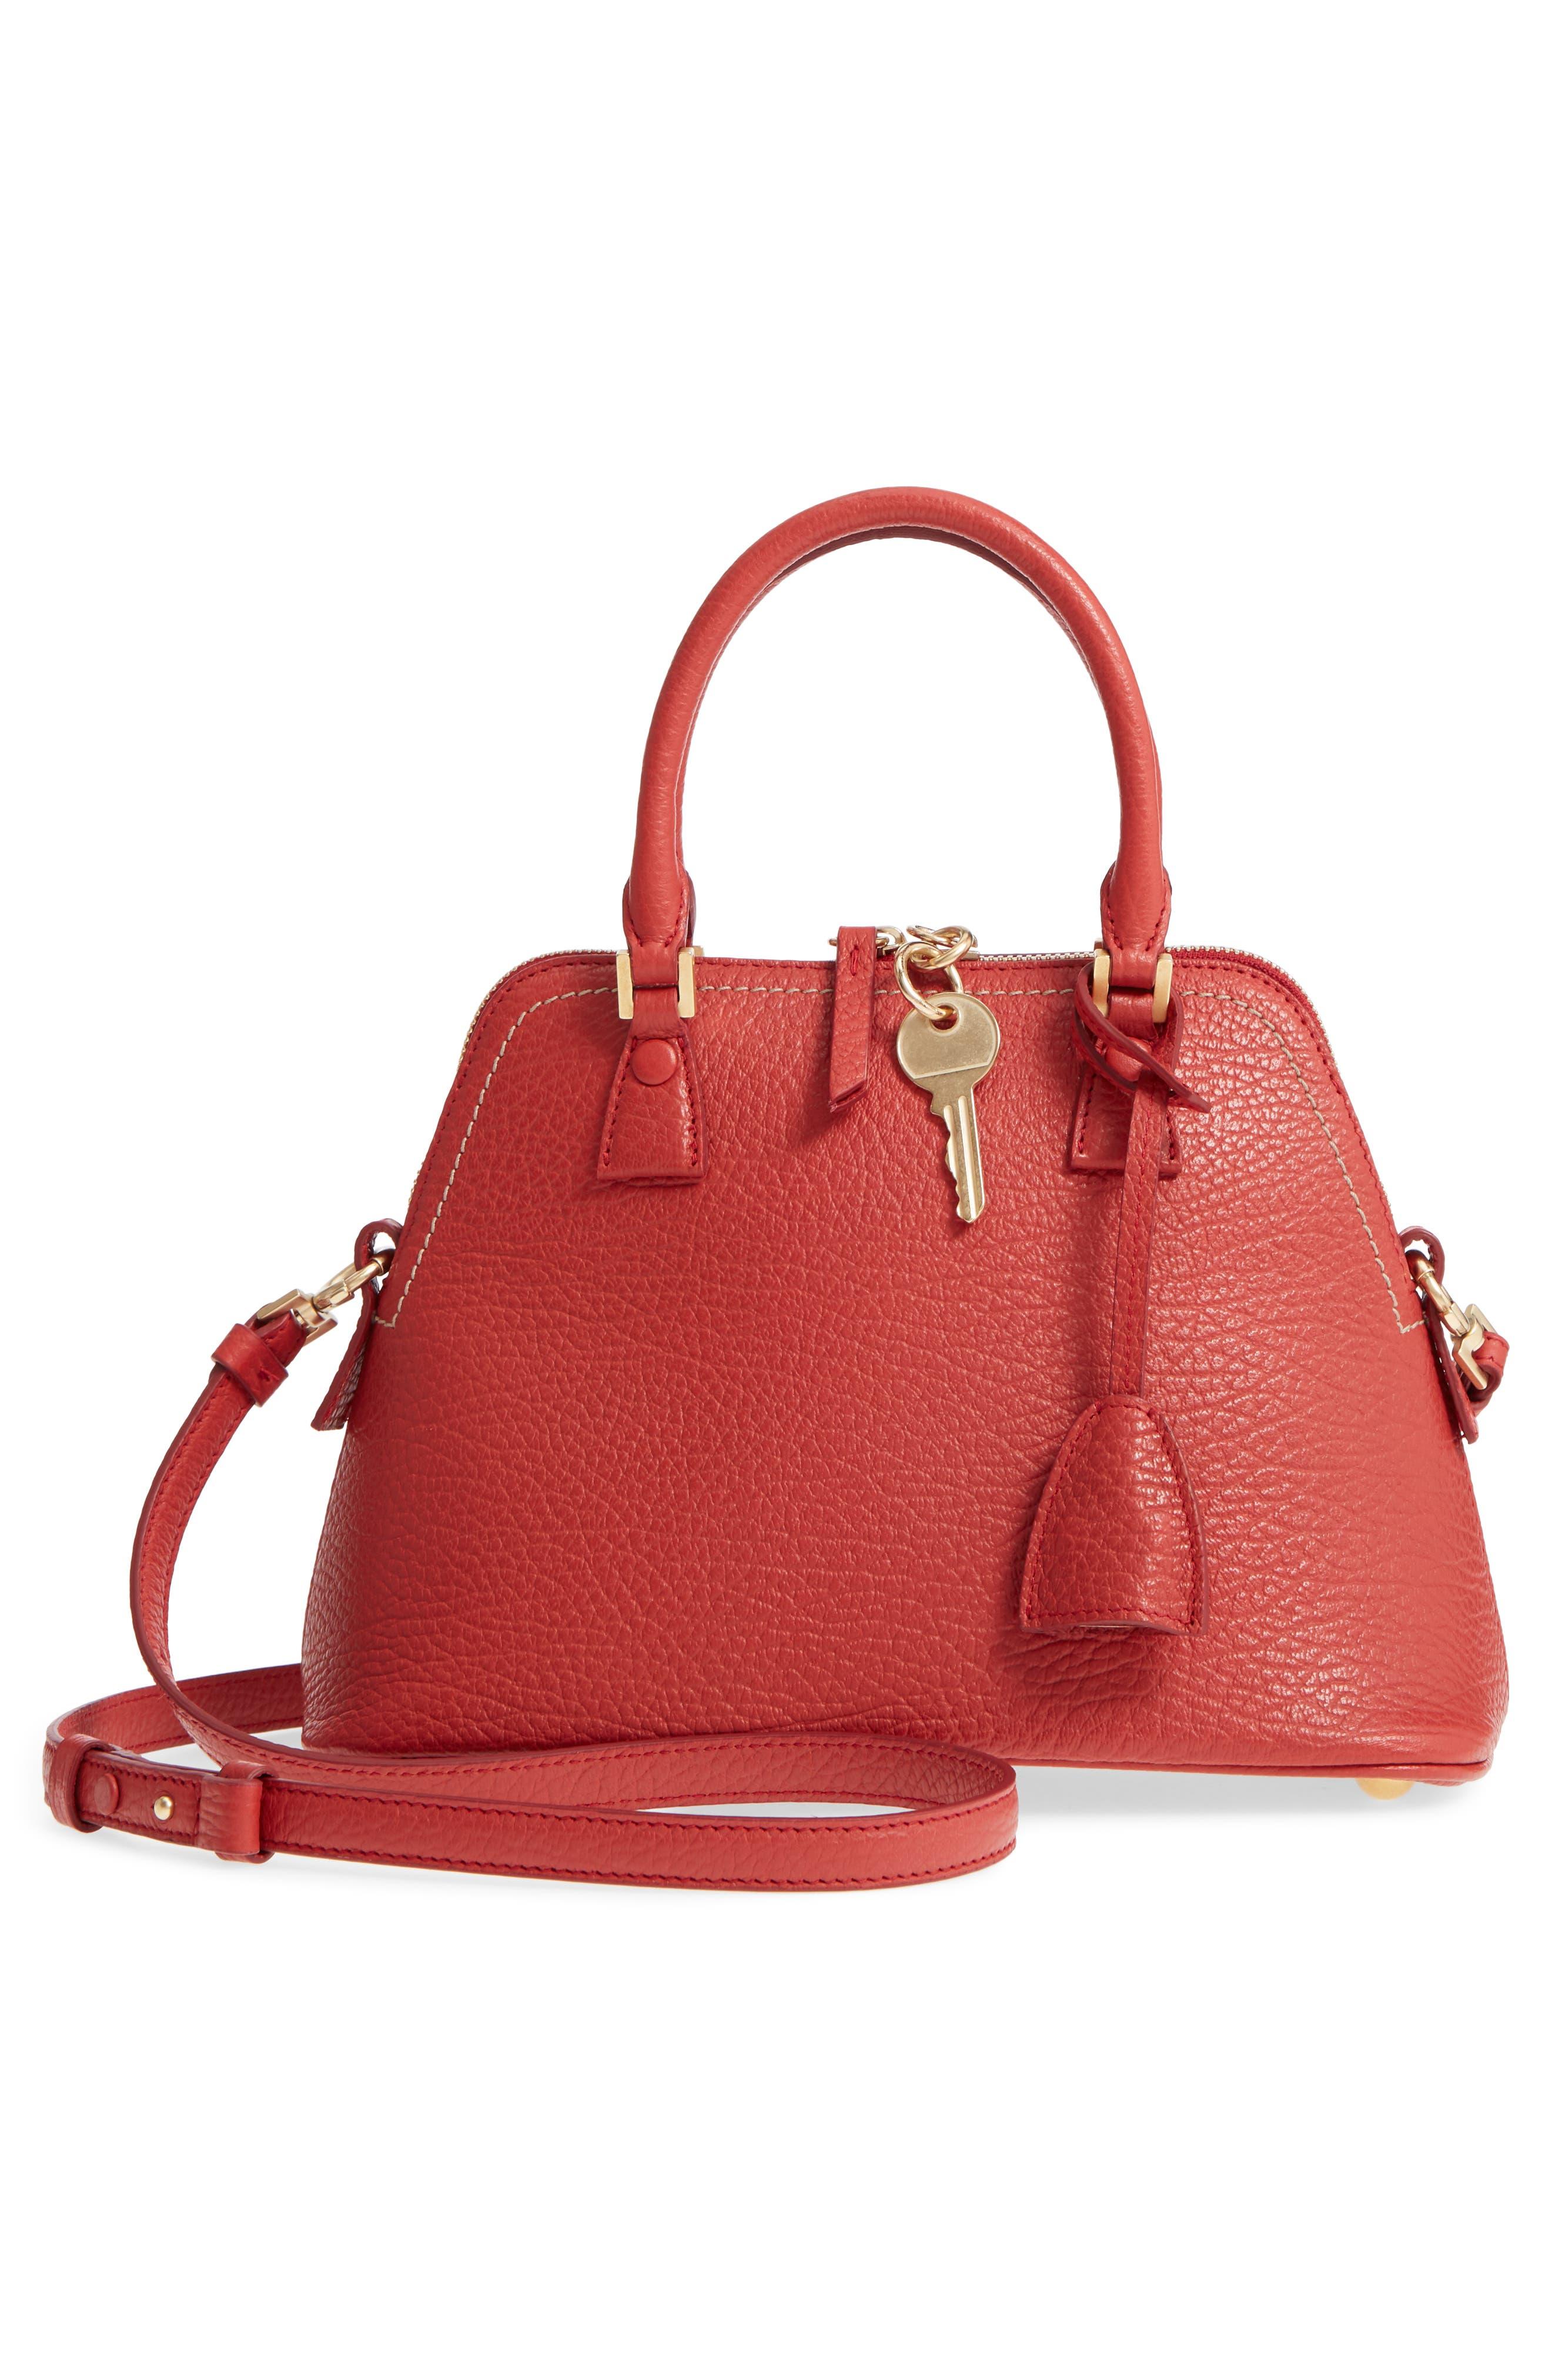 Small 5AC Calfskin Leather Handbag,                             Alternate thumbnail 3, color,                             600